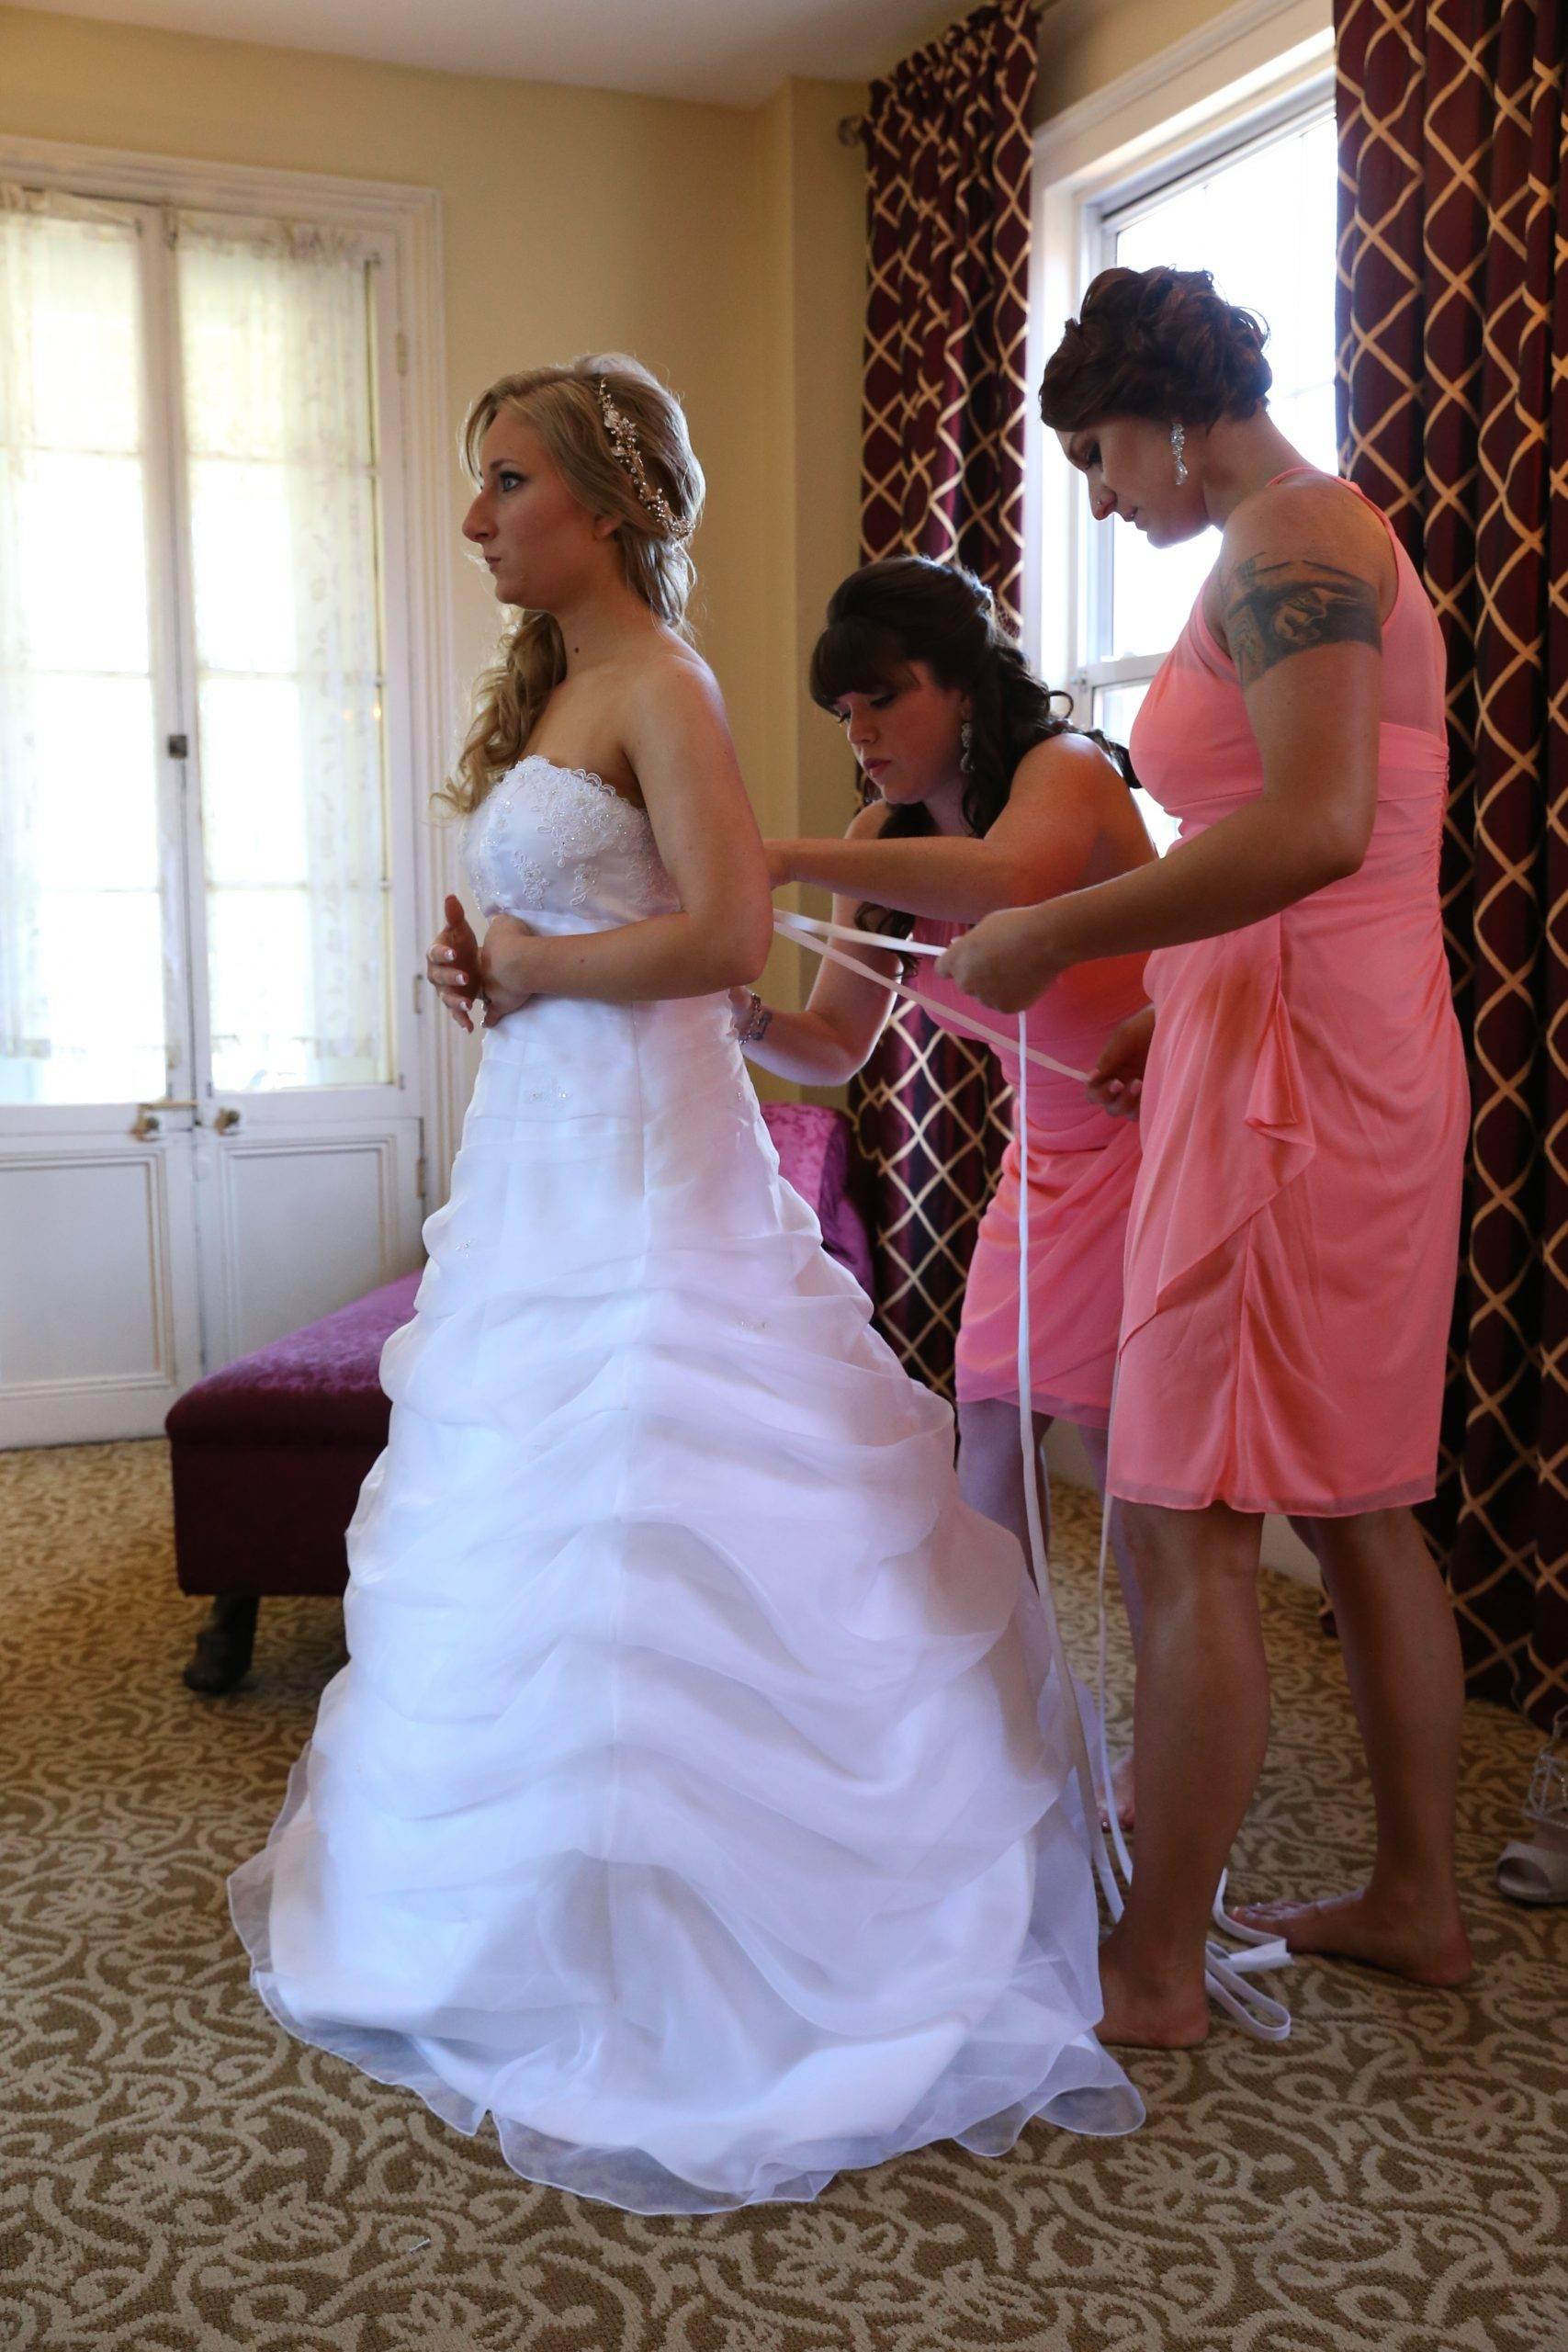 David's Country Inn bride getting dressed